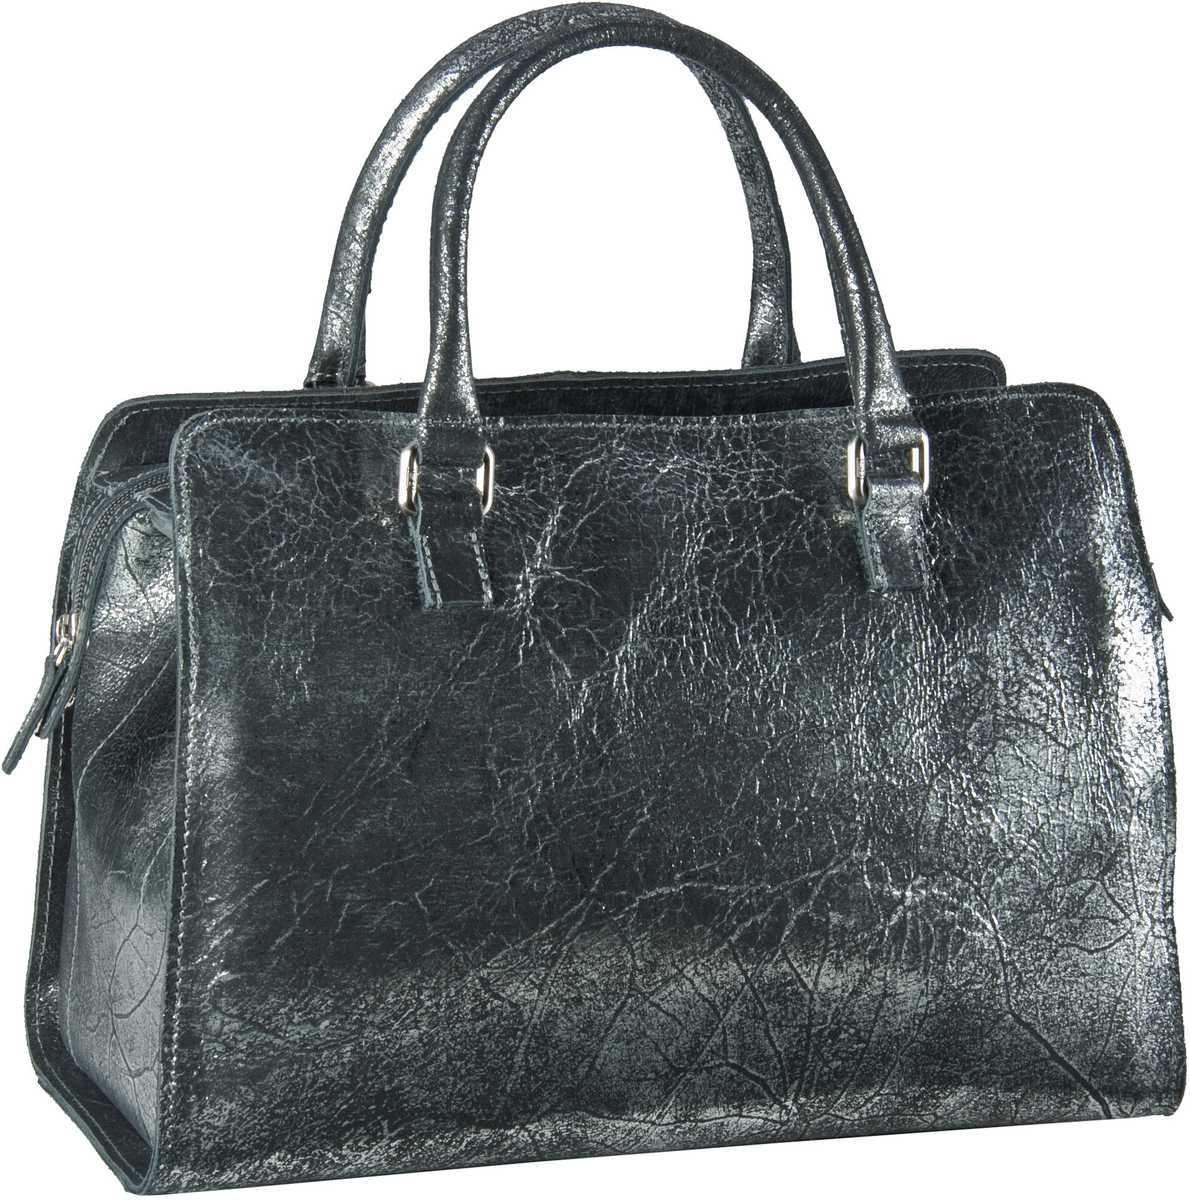 Jost Handtasche Night Light 1053 Handtasche Silver - Henkeltasche, Handtaschen